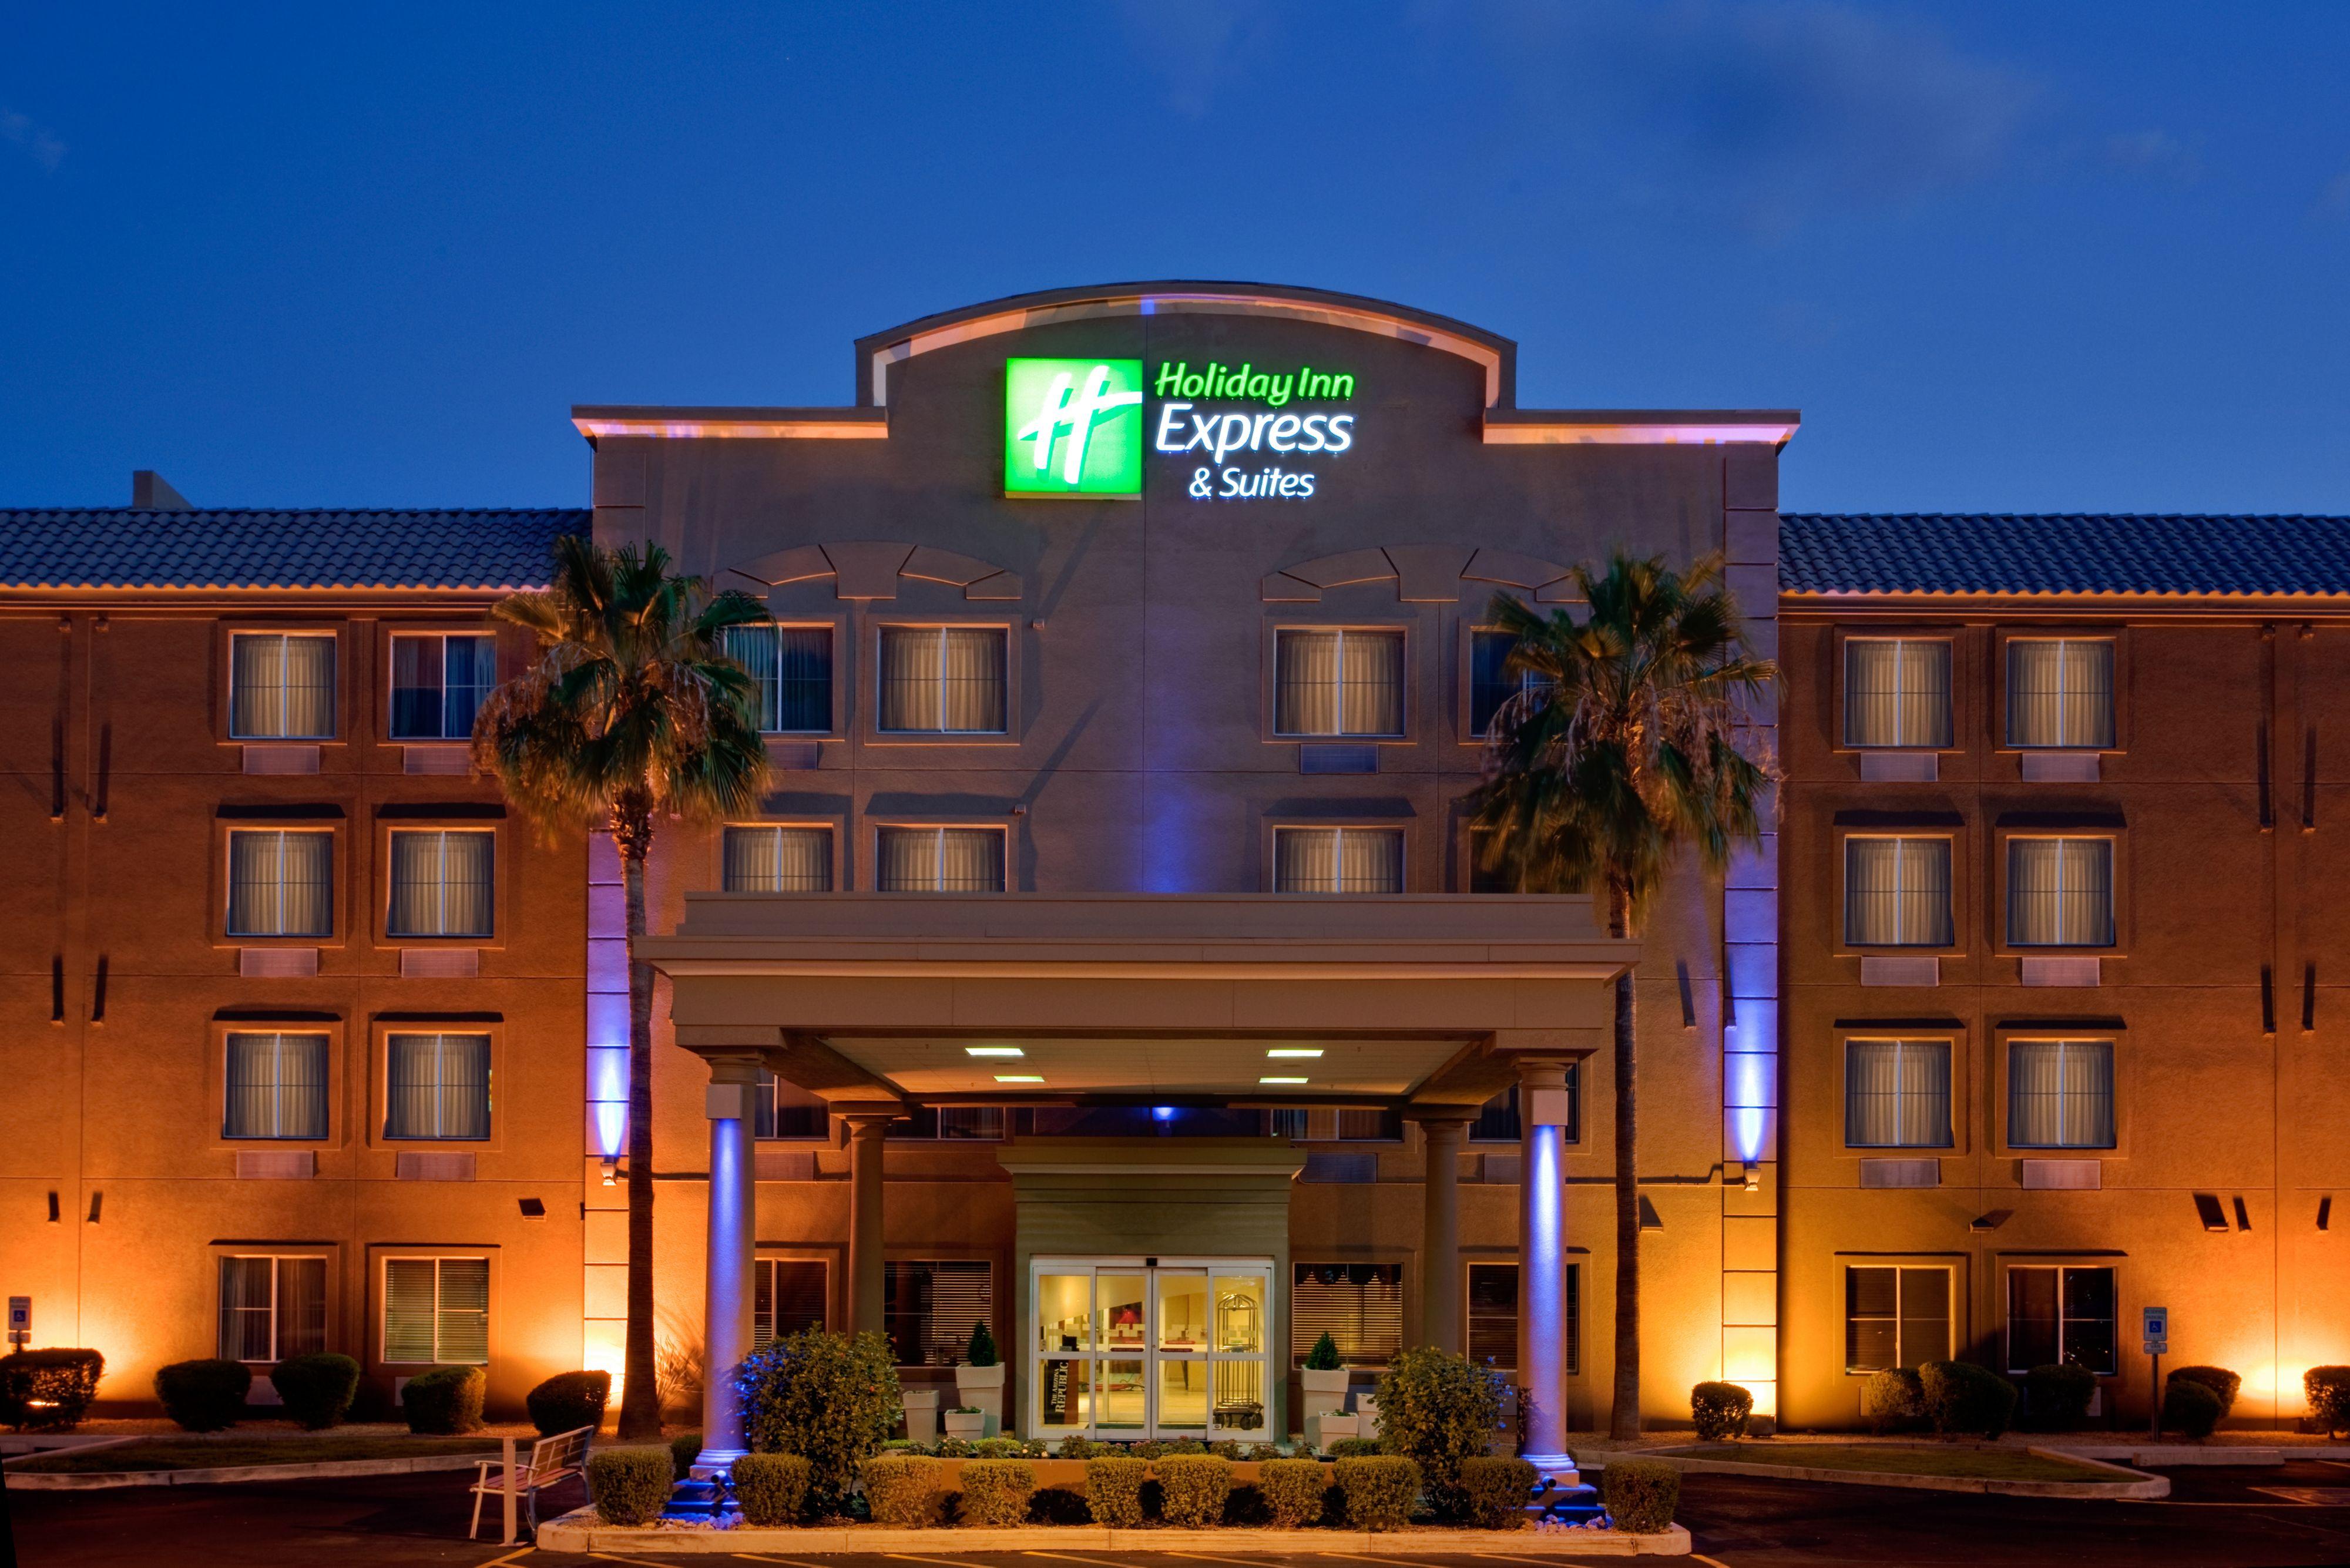 Holiday Inn Express & Suites Pensacola W I-10 image 5